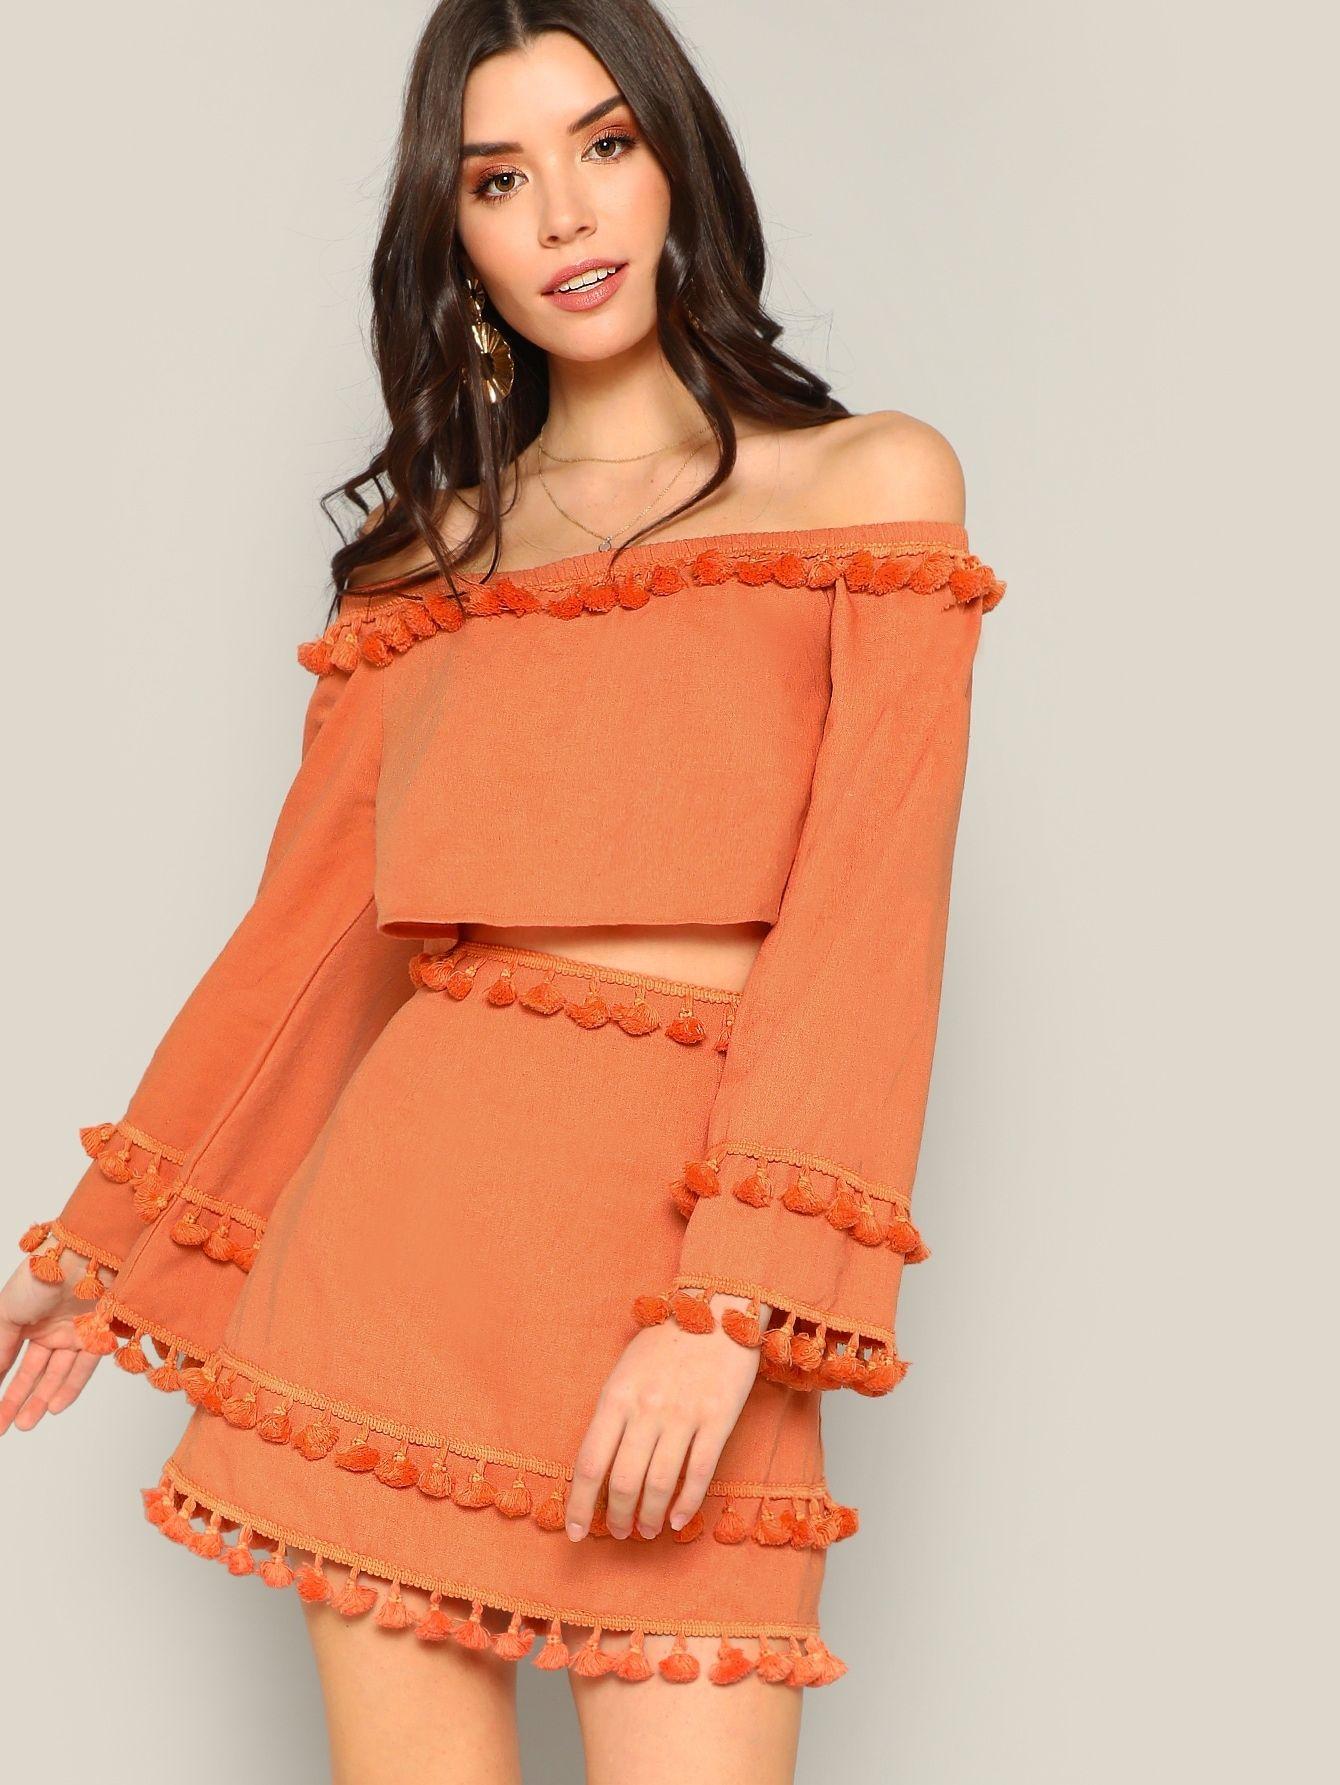 c12c7c5ec2d Off Shoulder Tassel Detail Top and Skirt Set #dress #woman #fashion #trend  #moda #women #twopiece